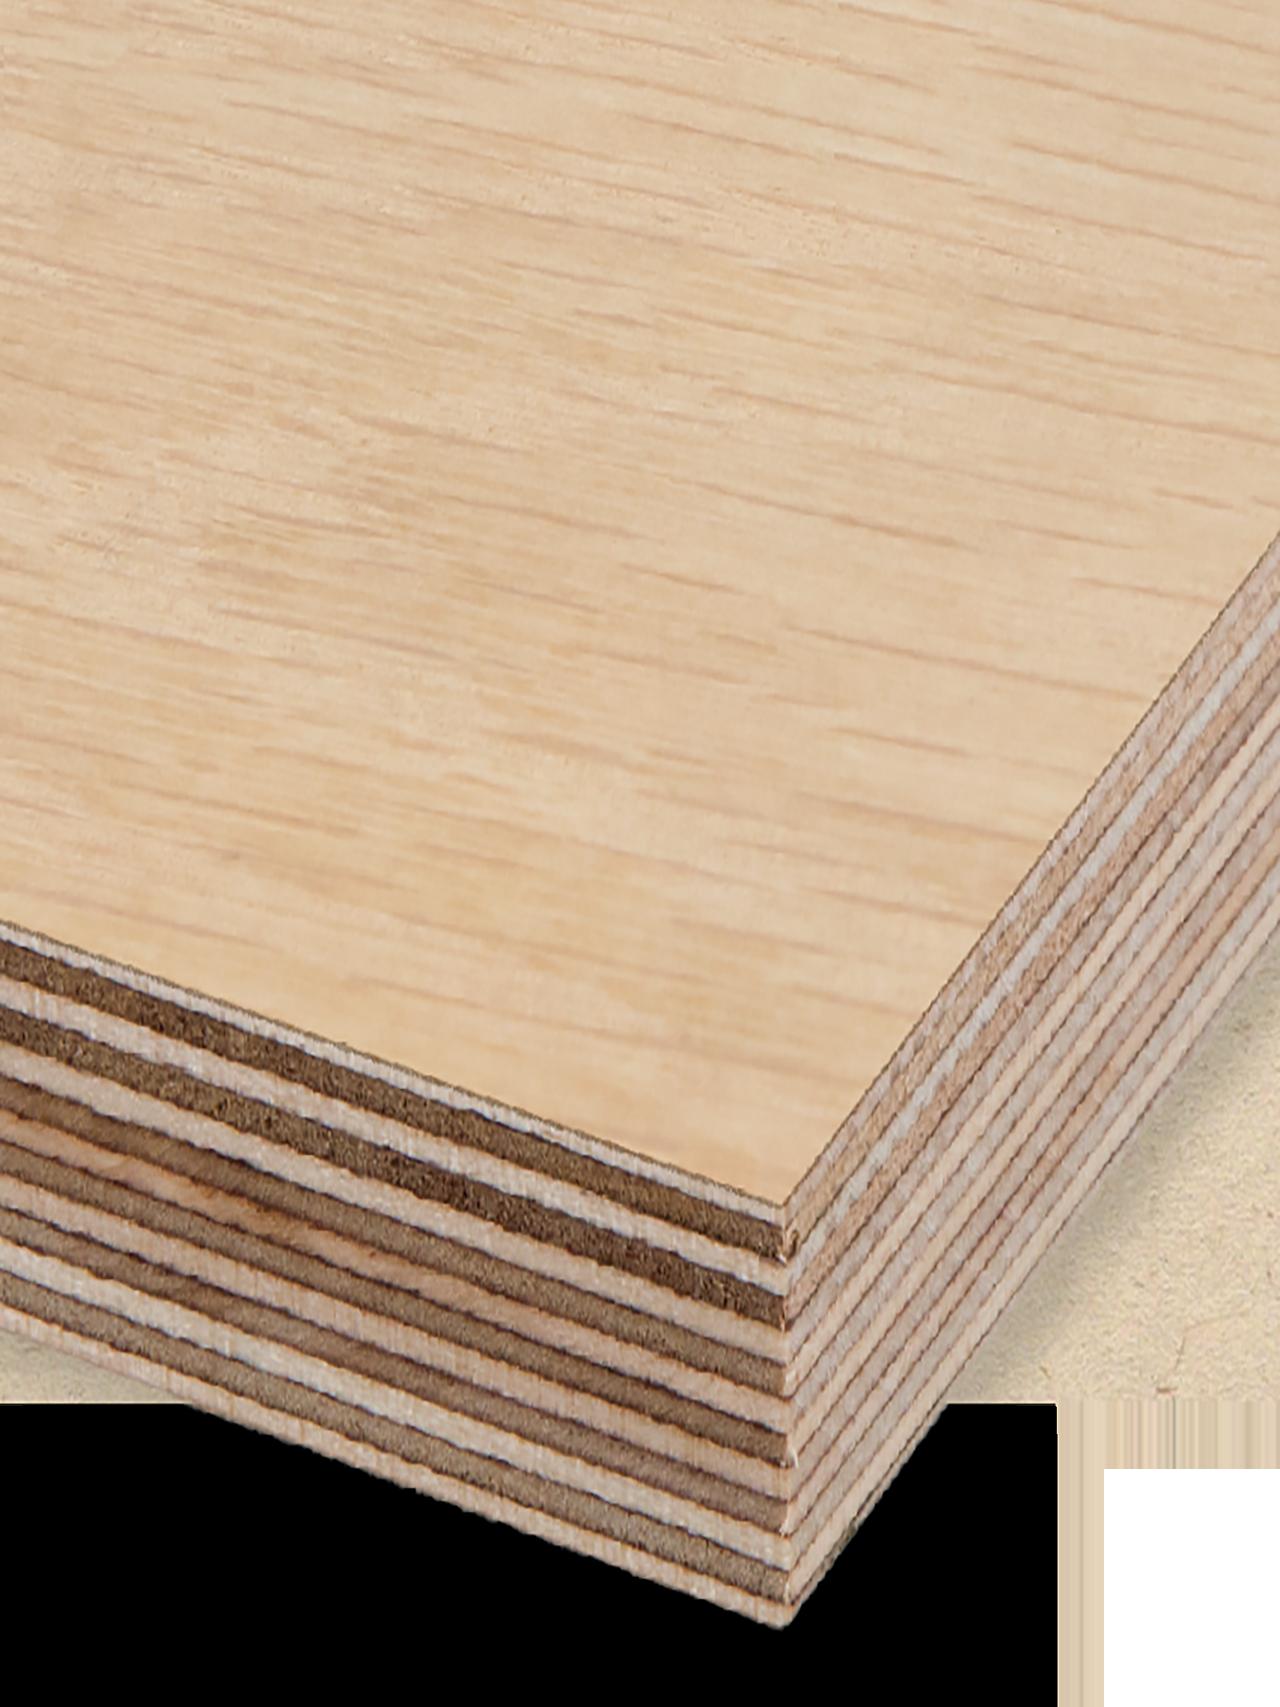 Veneered Birch Plywood E1